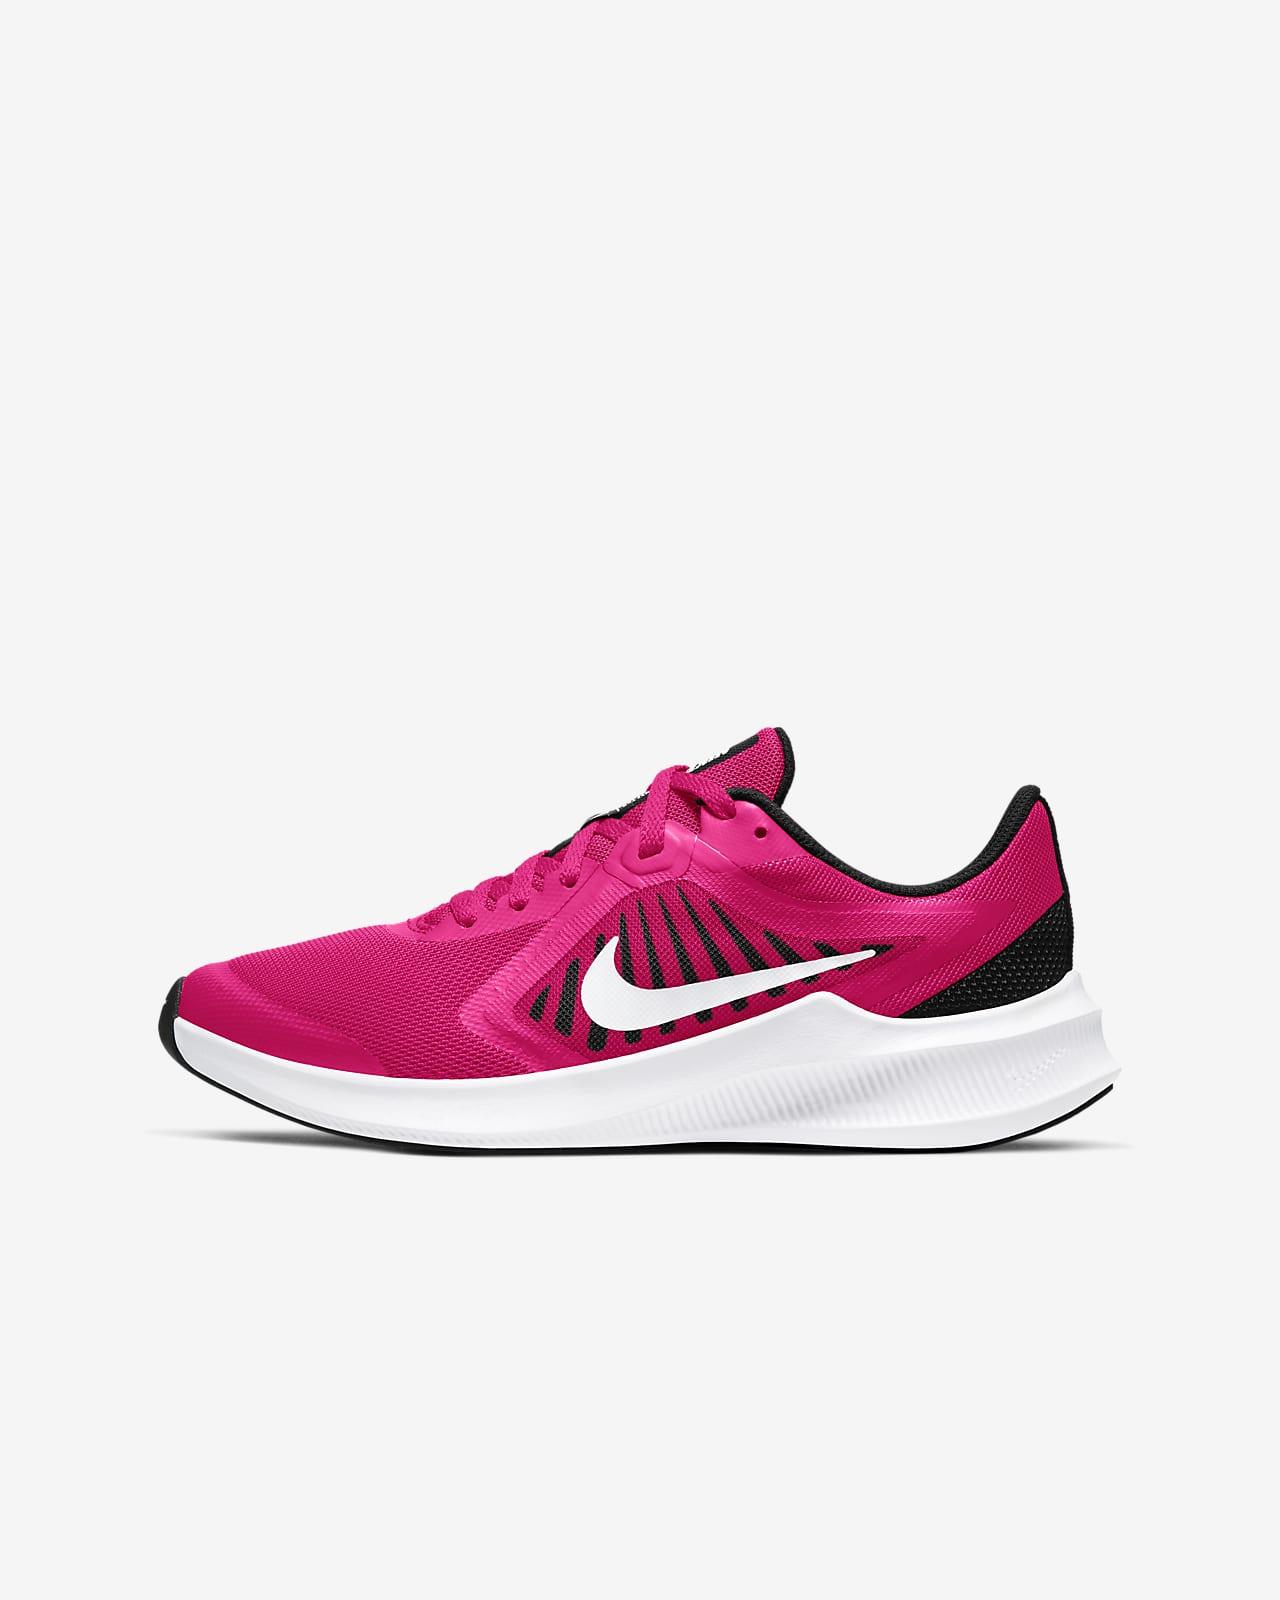 Nike Downshifter 10 Older Kids' Road Running Shoes